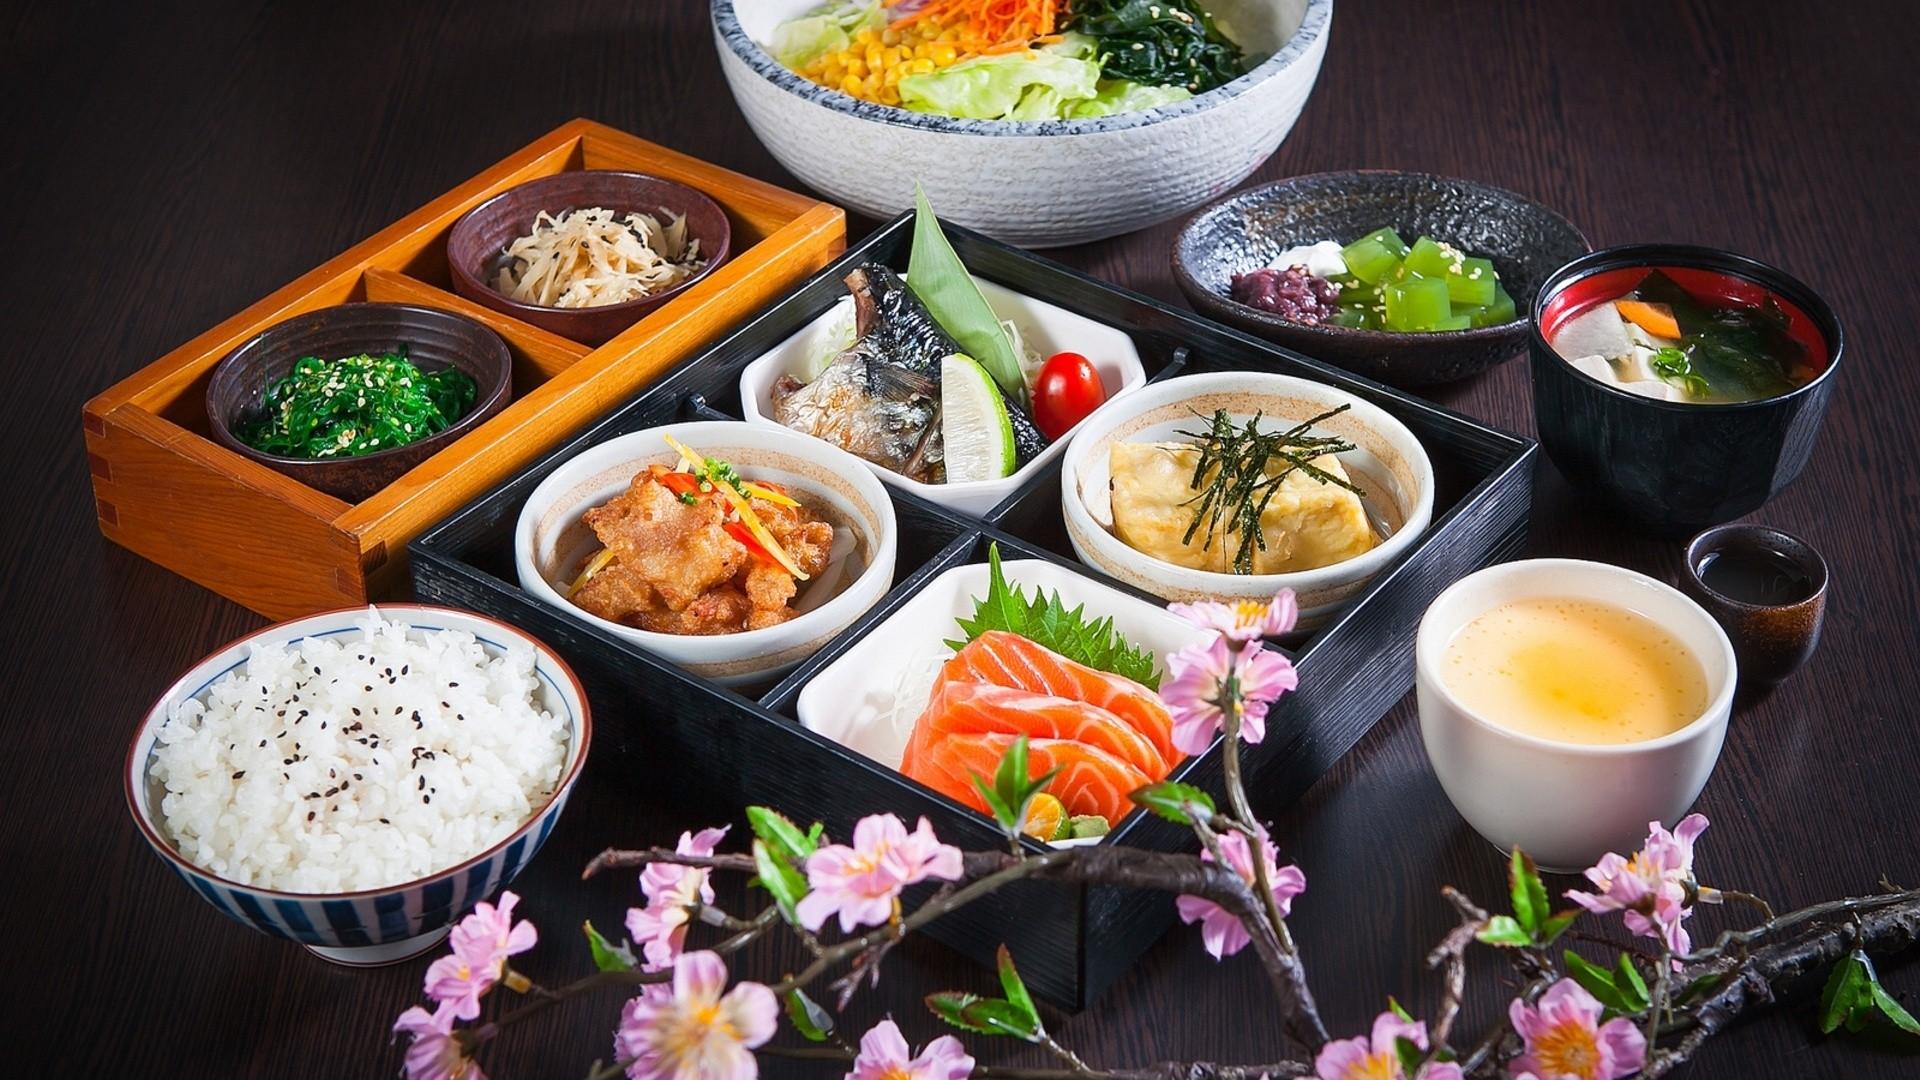 Wallpaper Lunch Rice Meal Cuisine Buffet Dish Asian